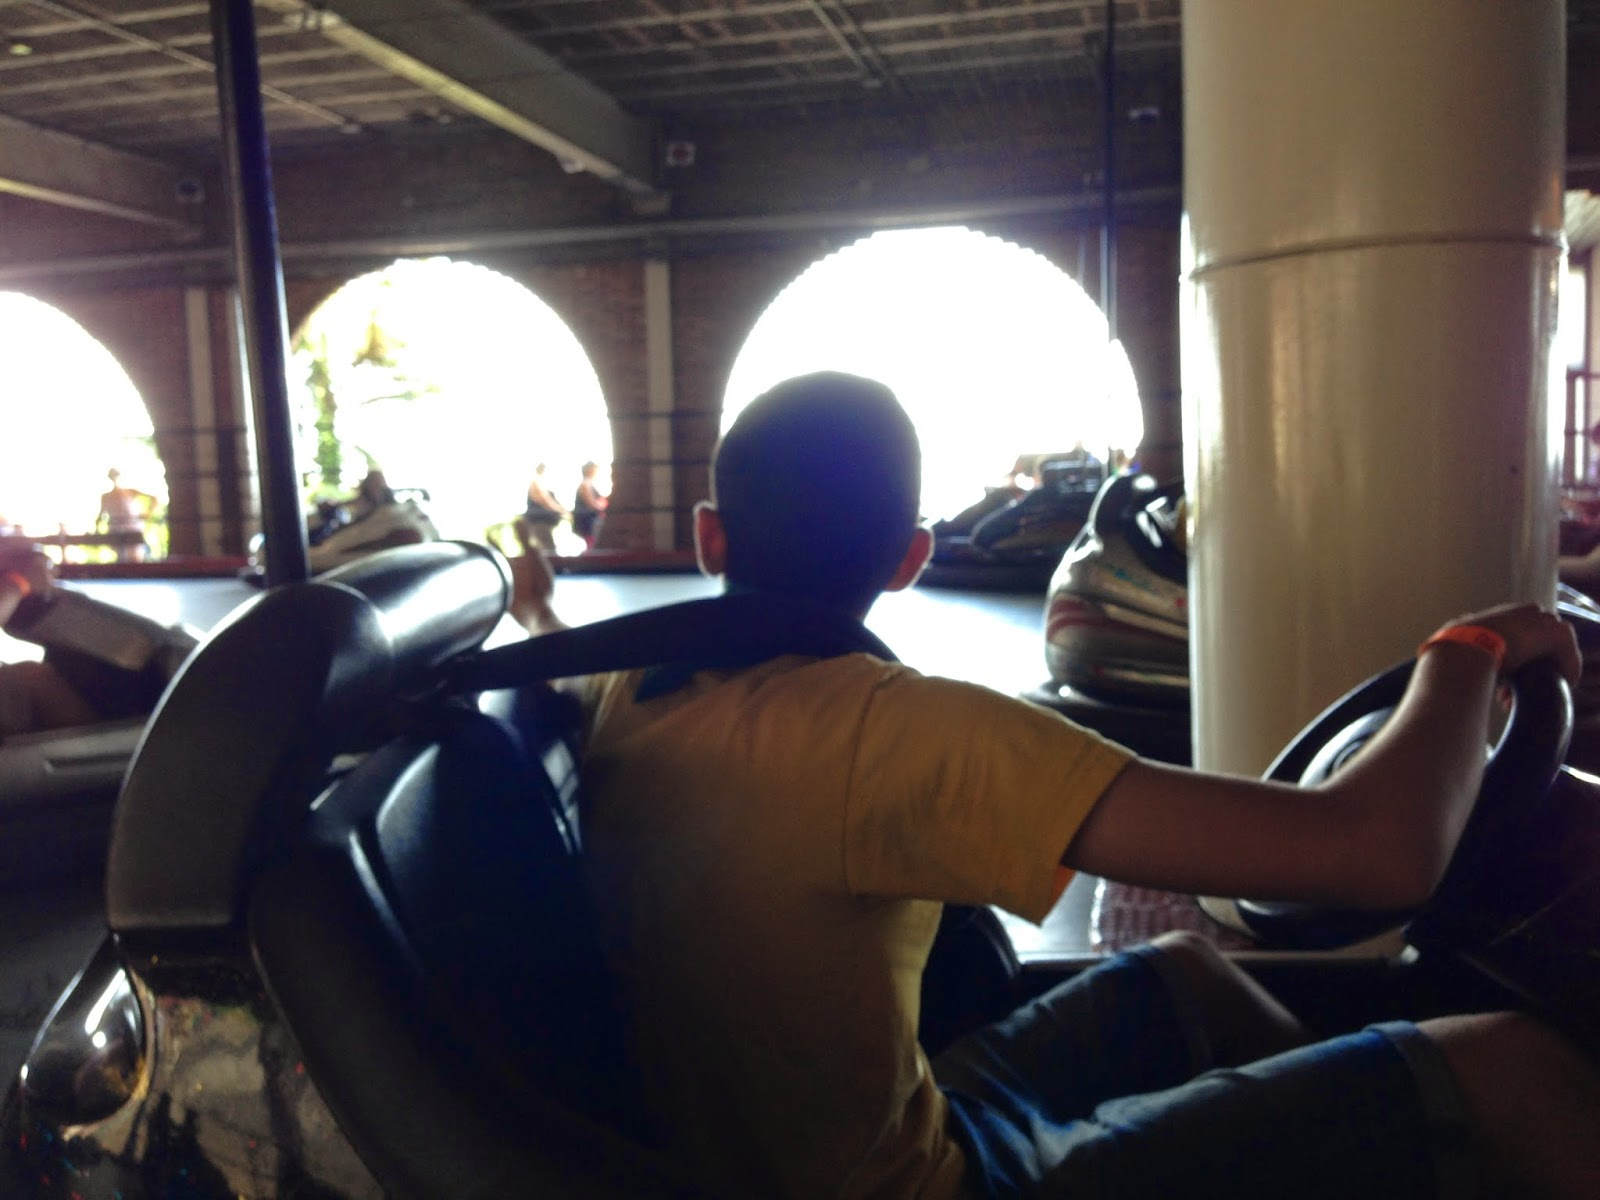 Tibidabo 2013 - IMG_0128.JPG